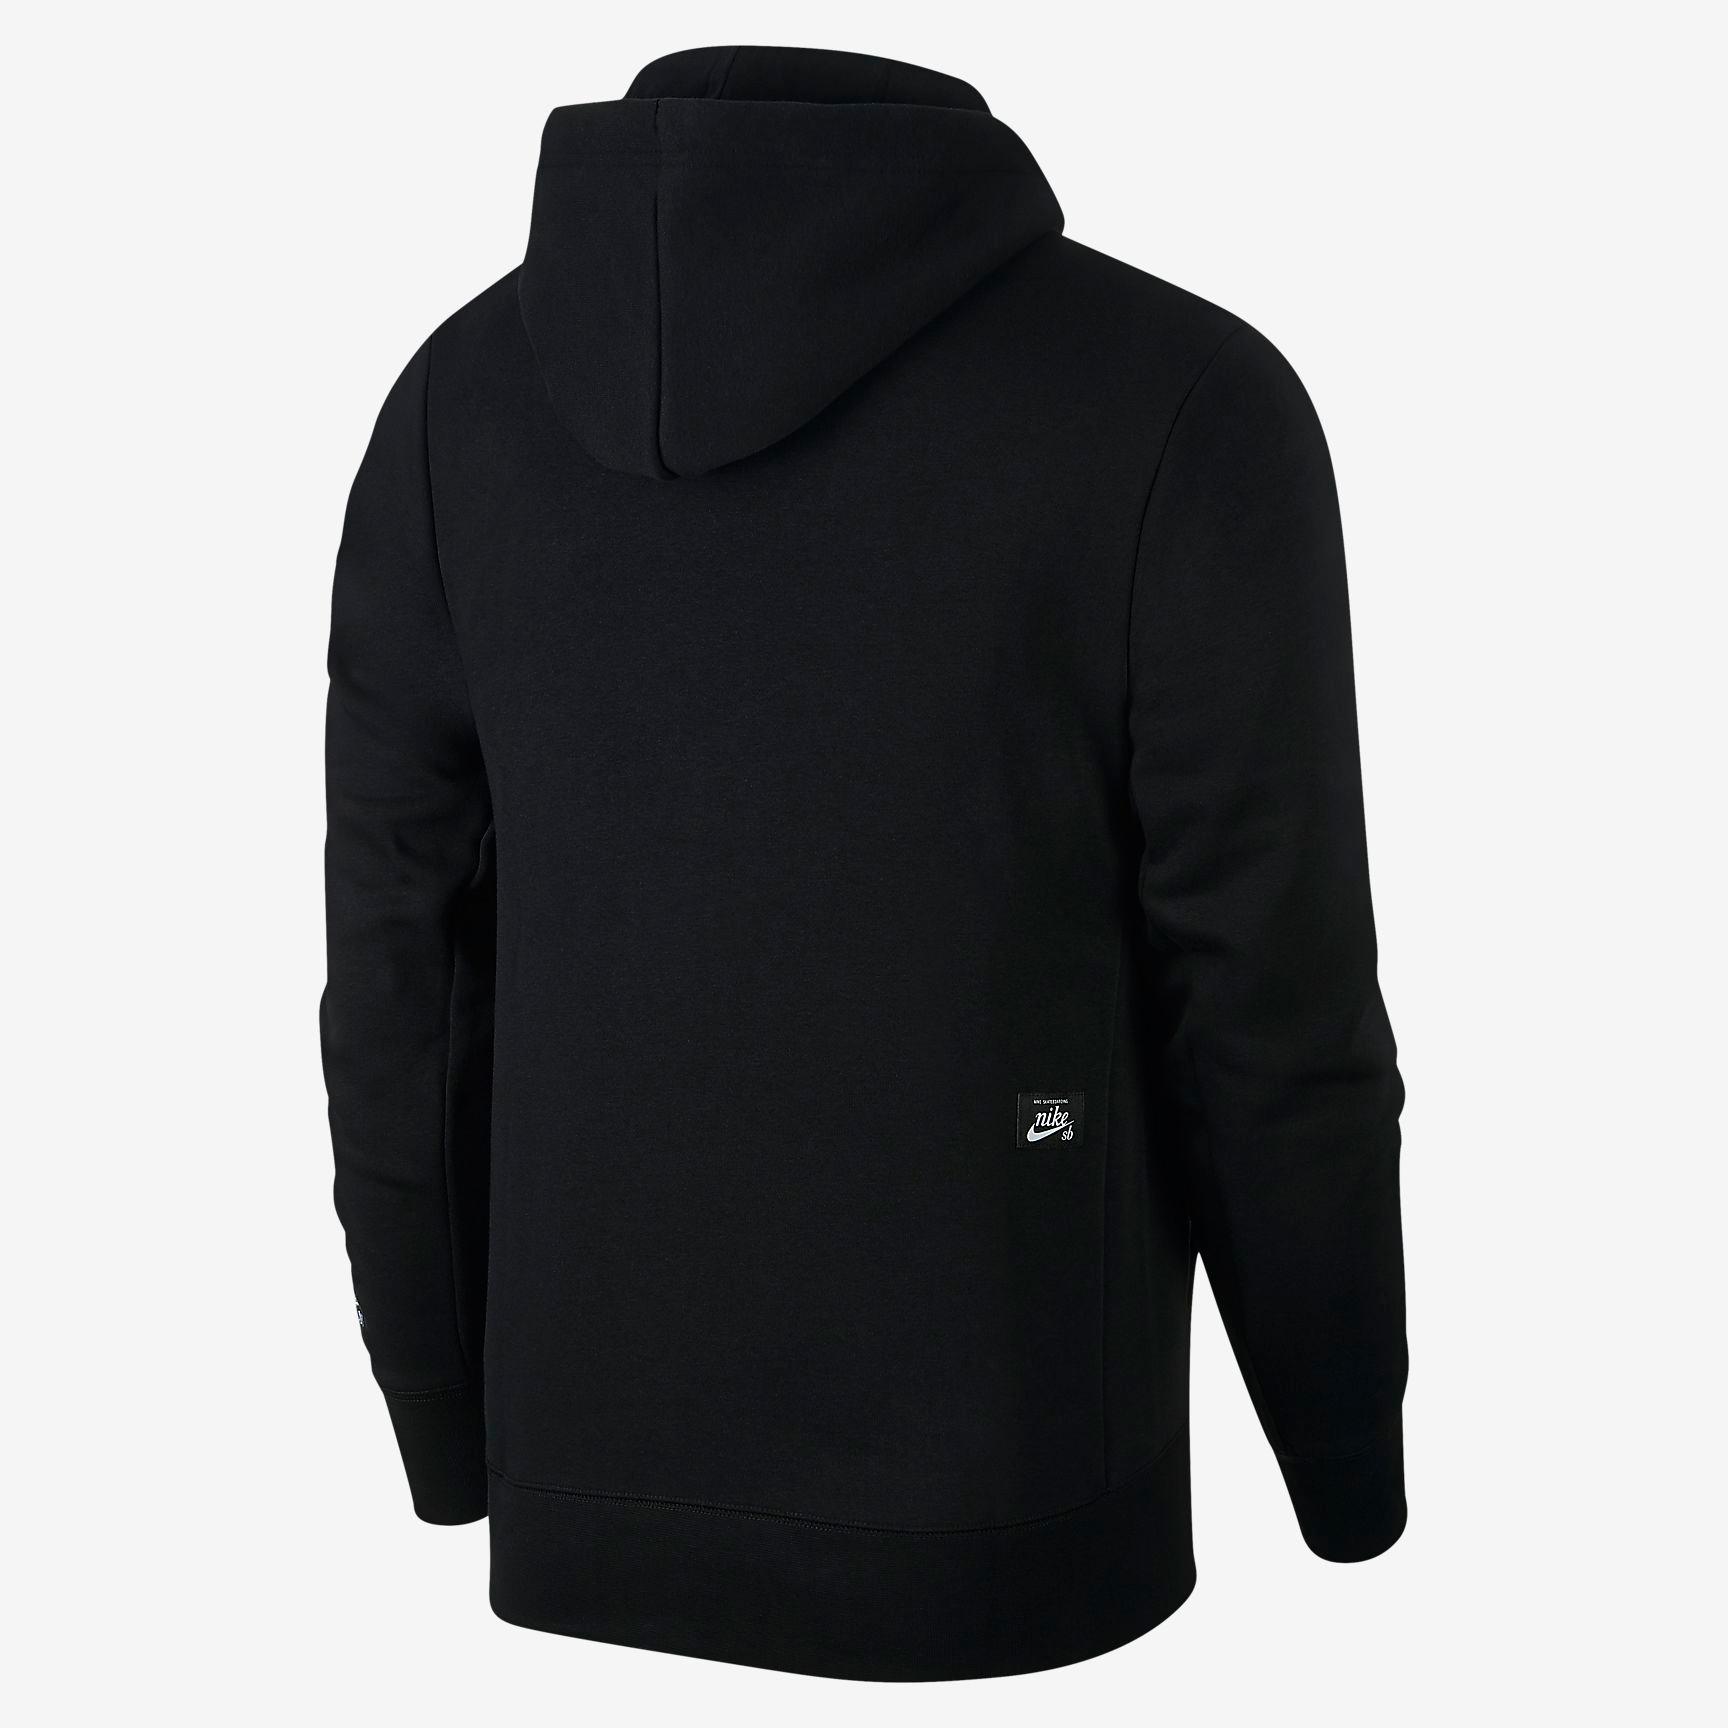 nike-sb-nba-black-hoodie-2